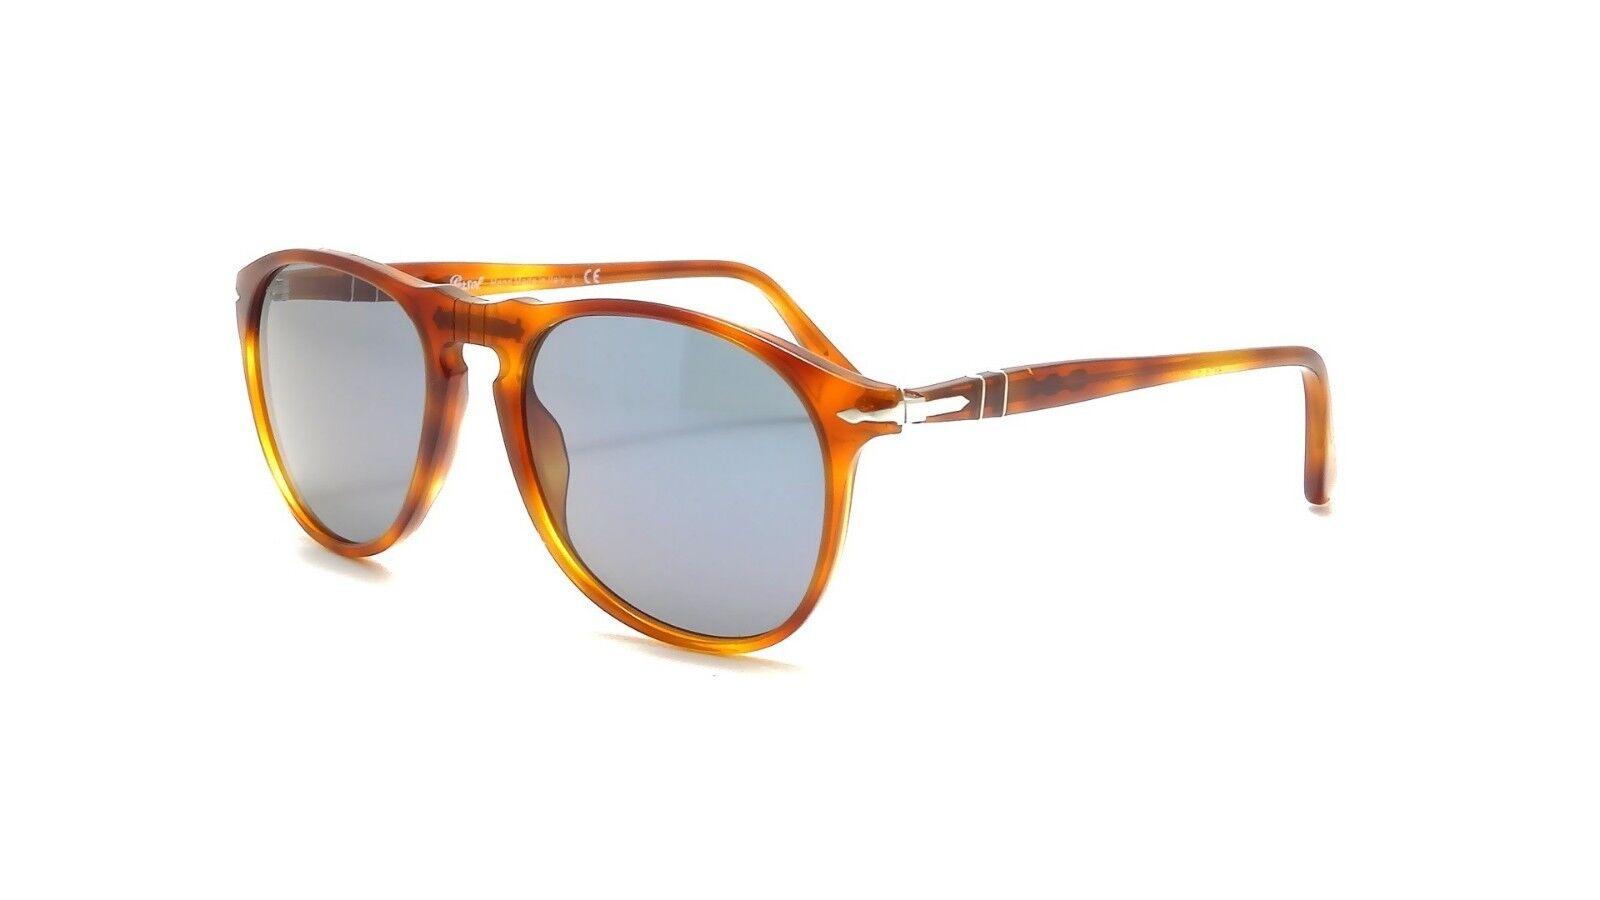 146060d9fc4f Persol Sunglasses PO 9649 96/56 Authentic Havana Terra Di Siena Blue ...